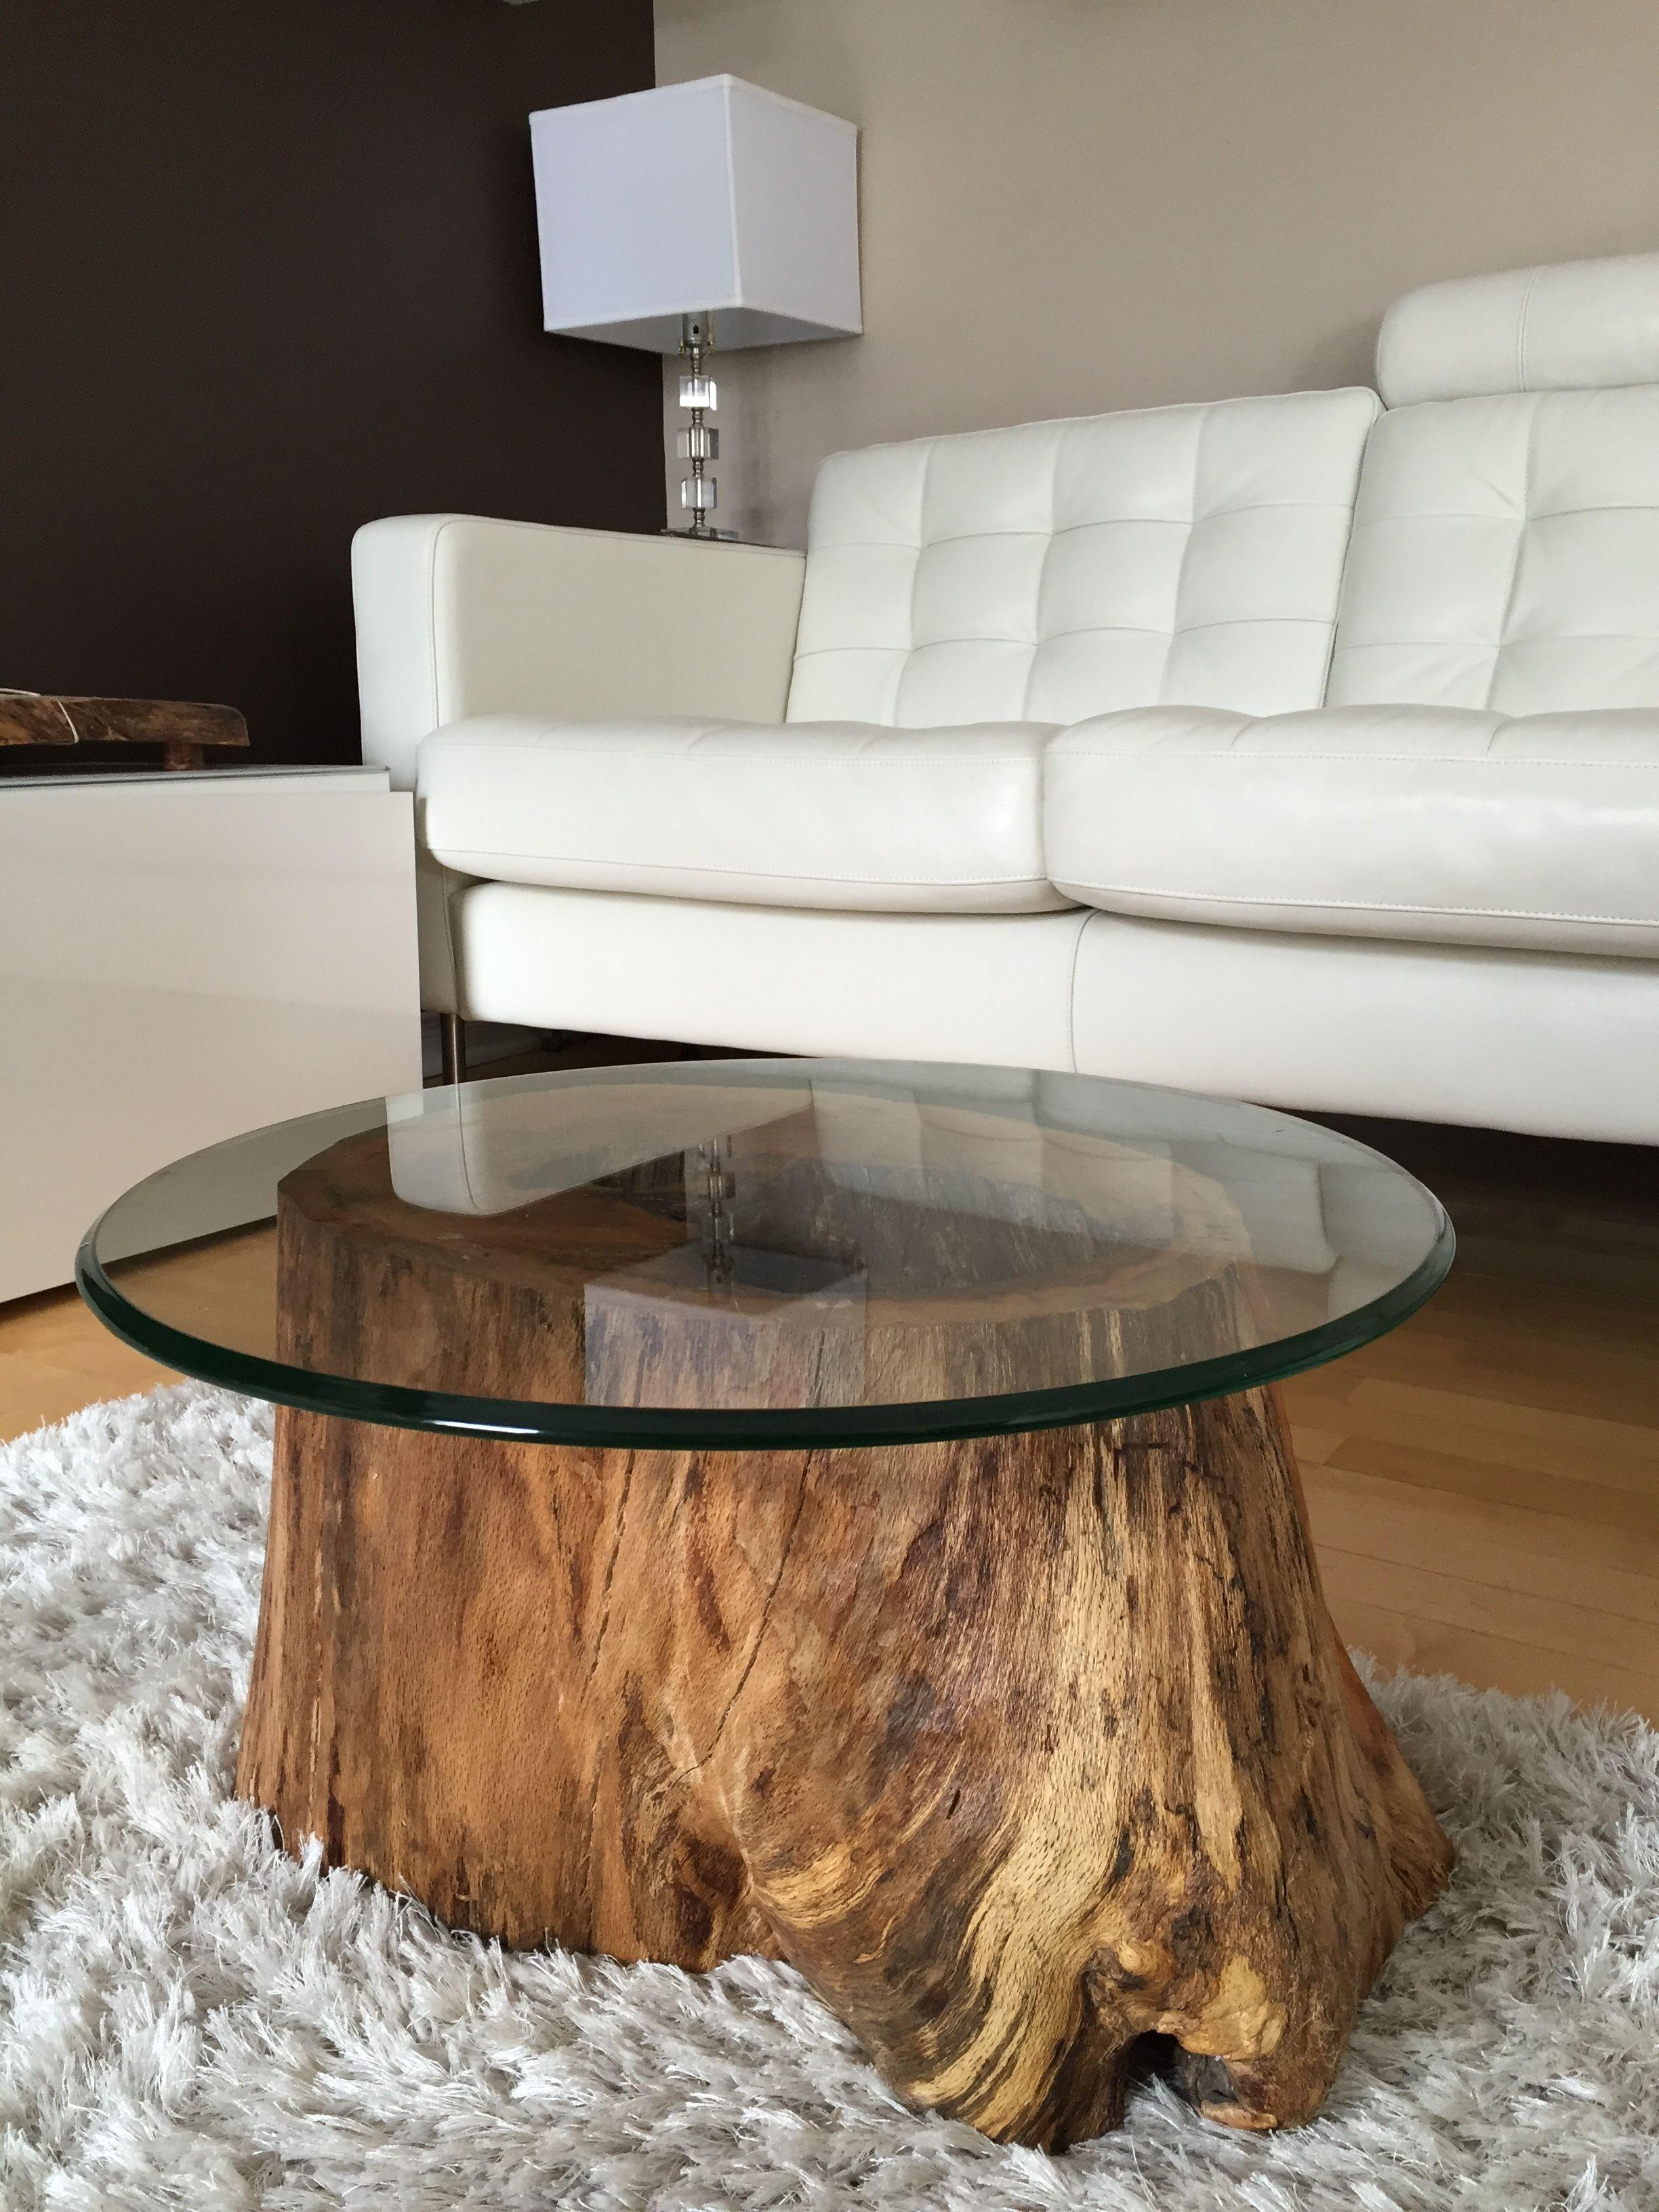 14 Tree Stump Coffee Table For Sale Ideas Coffee Table Log Coffee Table Coffee Table Furniture